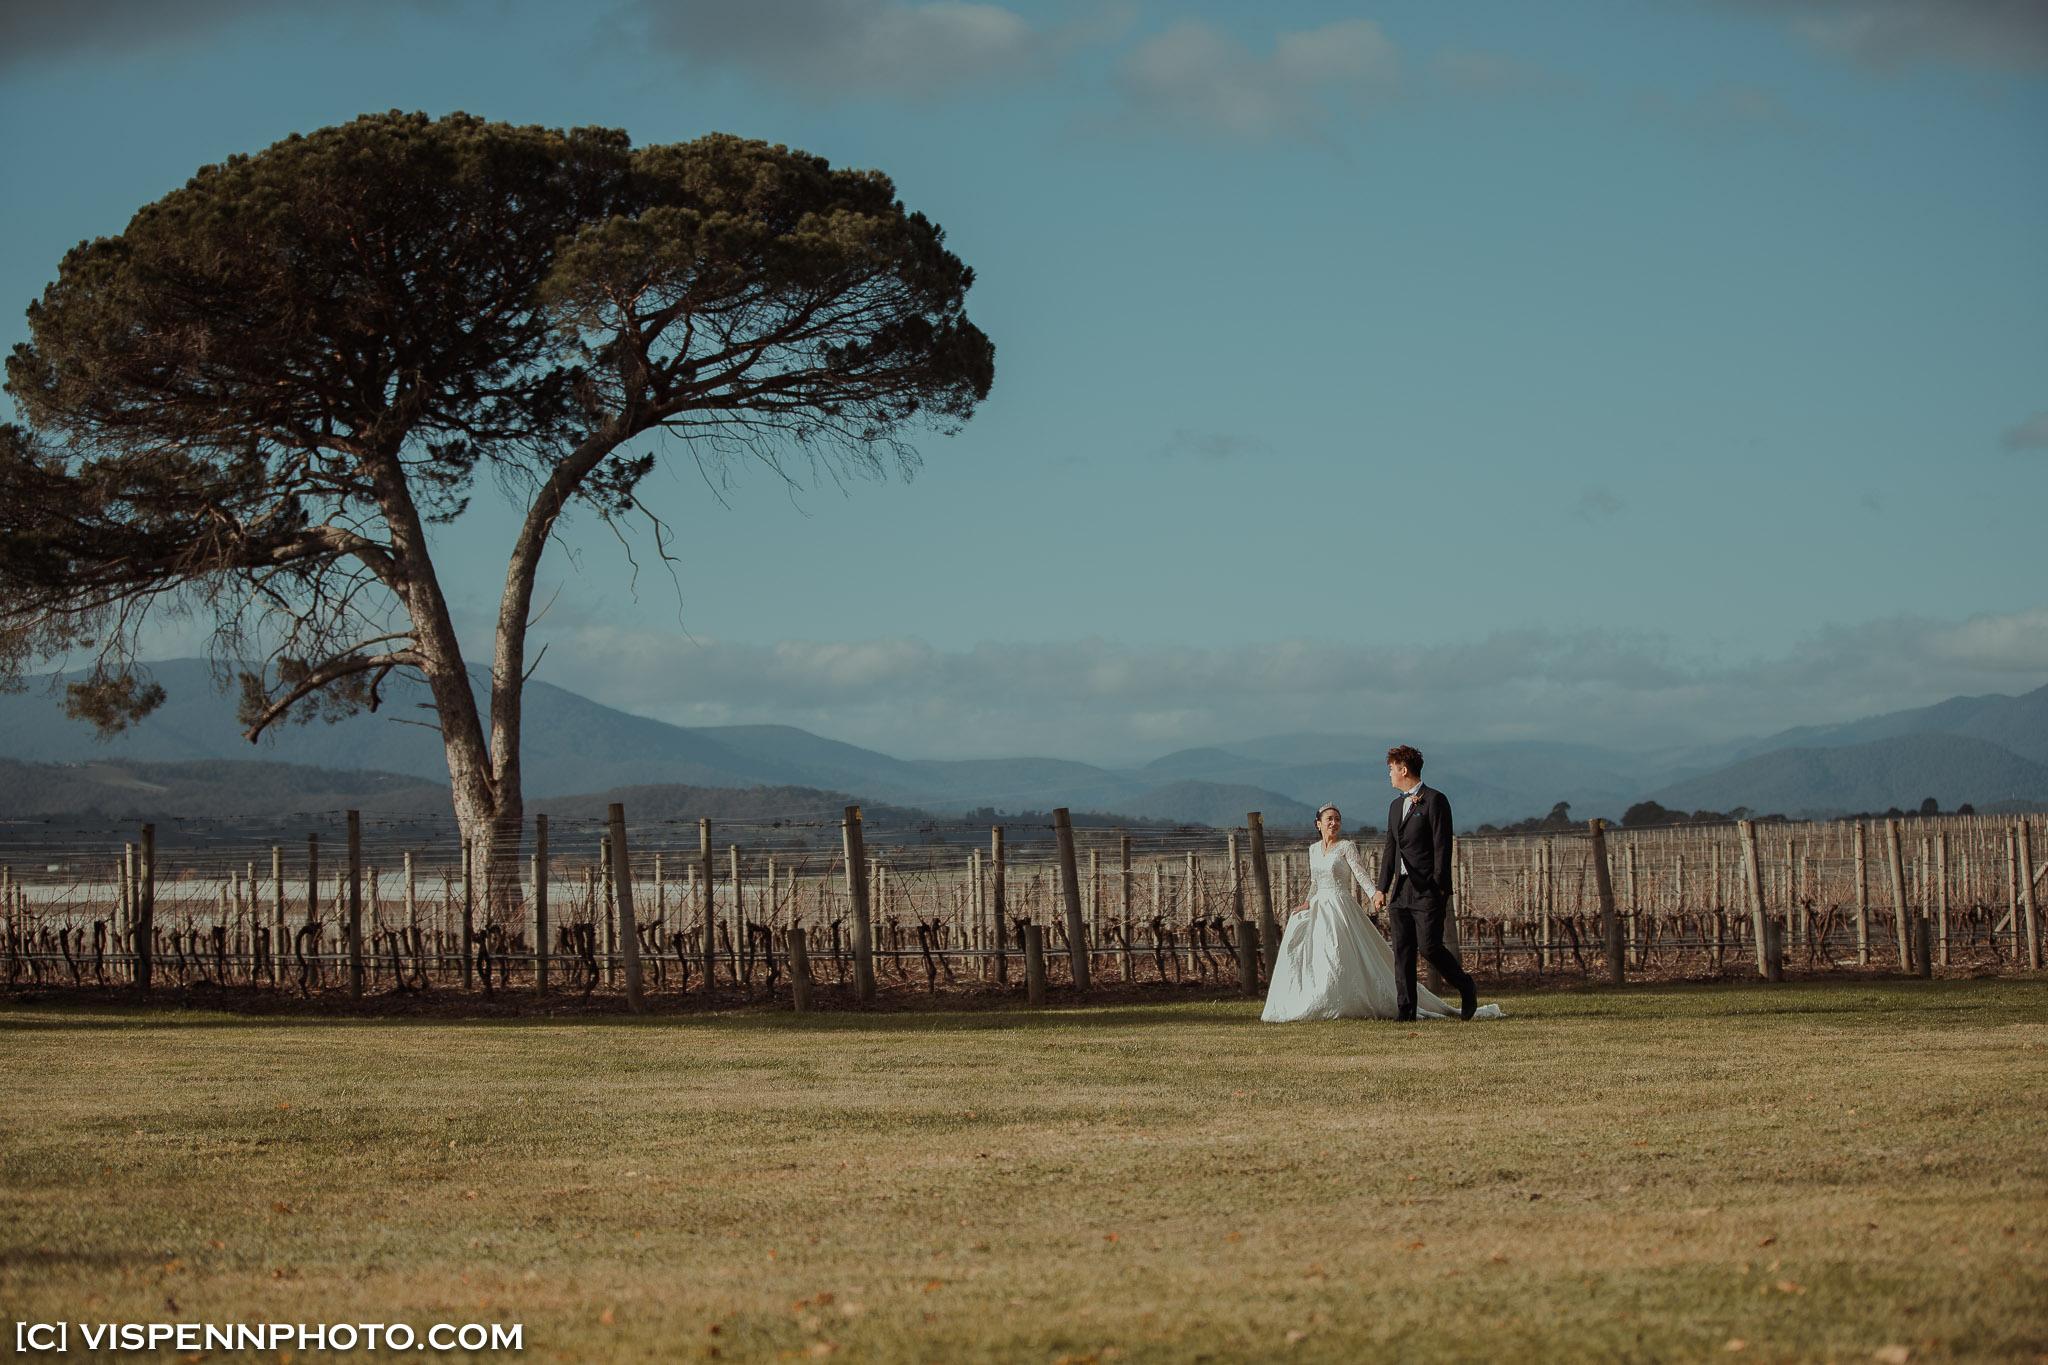 WEDDING DAY Photography Melbourne VISPENN 墨尔本 婚礼跟拍 婚礼摄像 婚礼摄影 结婚照 登记照 CoreyCoco 3P 07654 1DX VISPENN